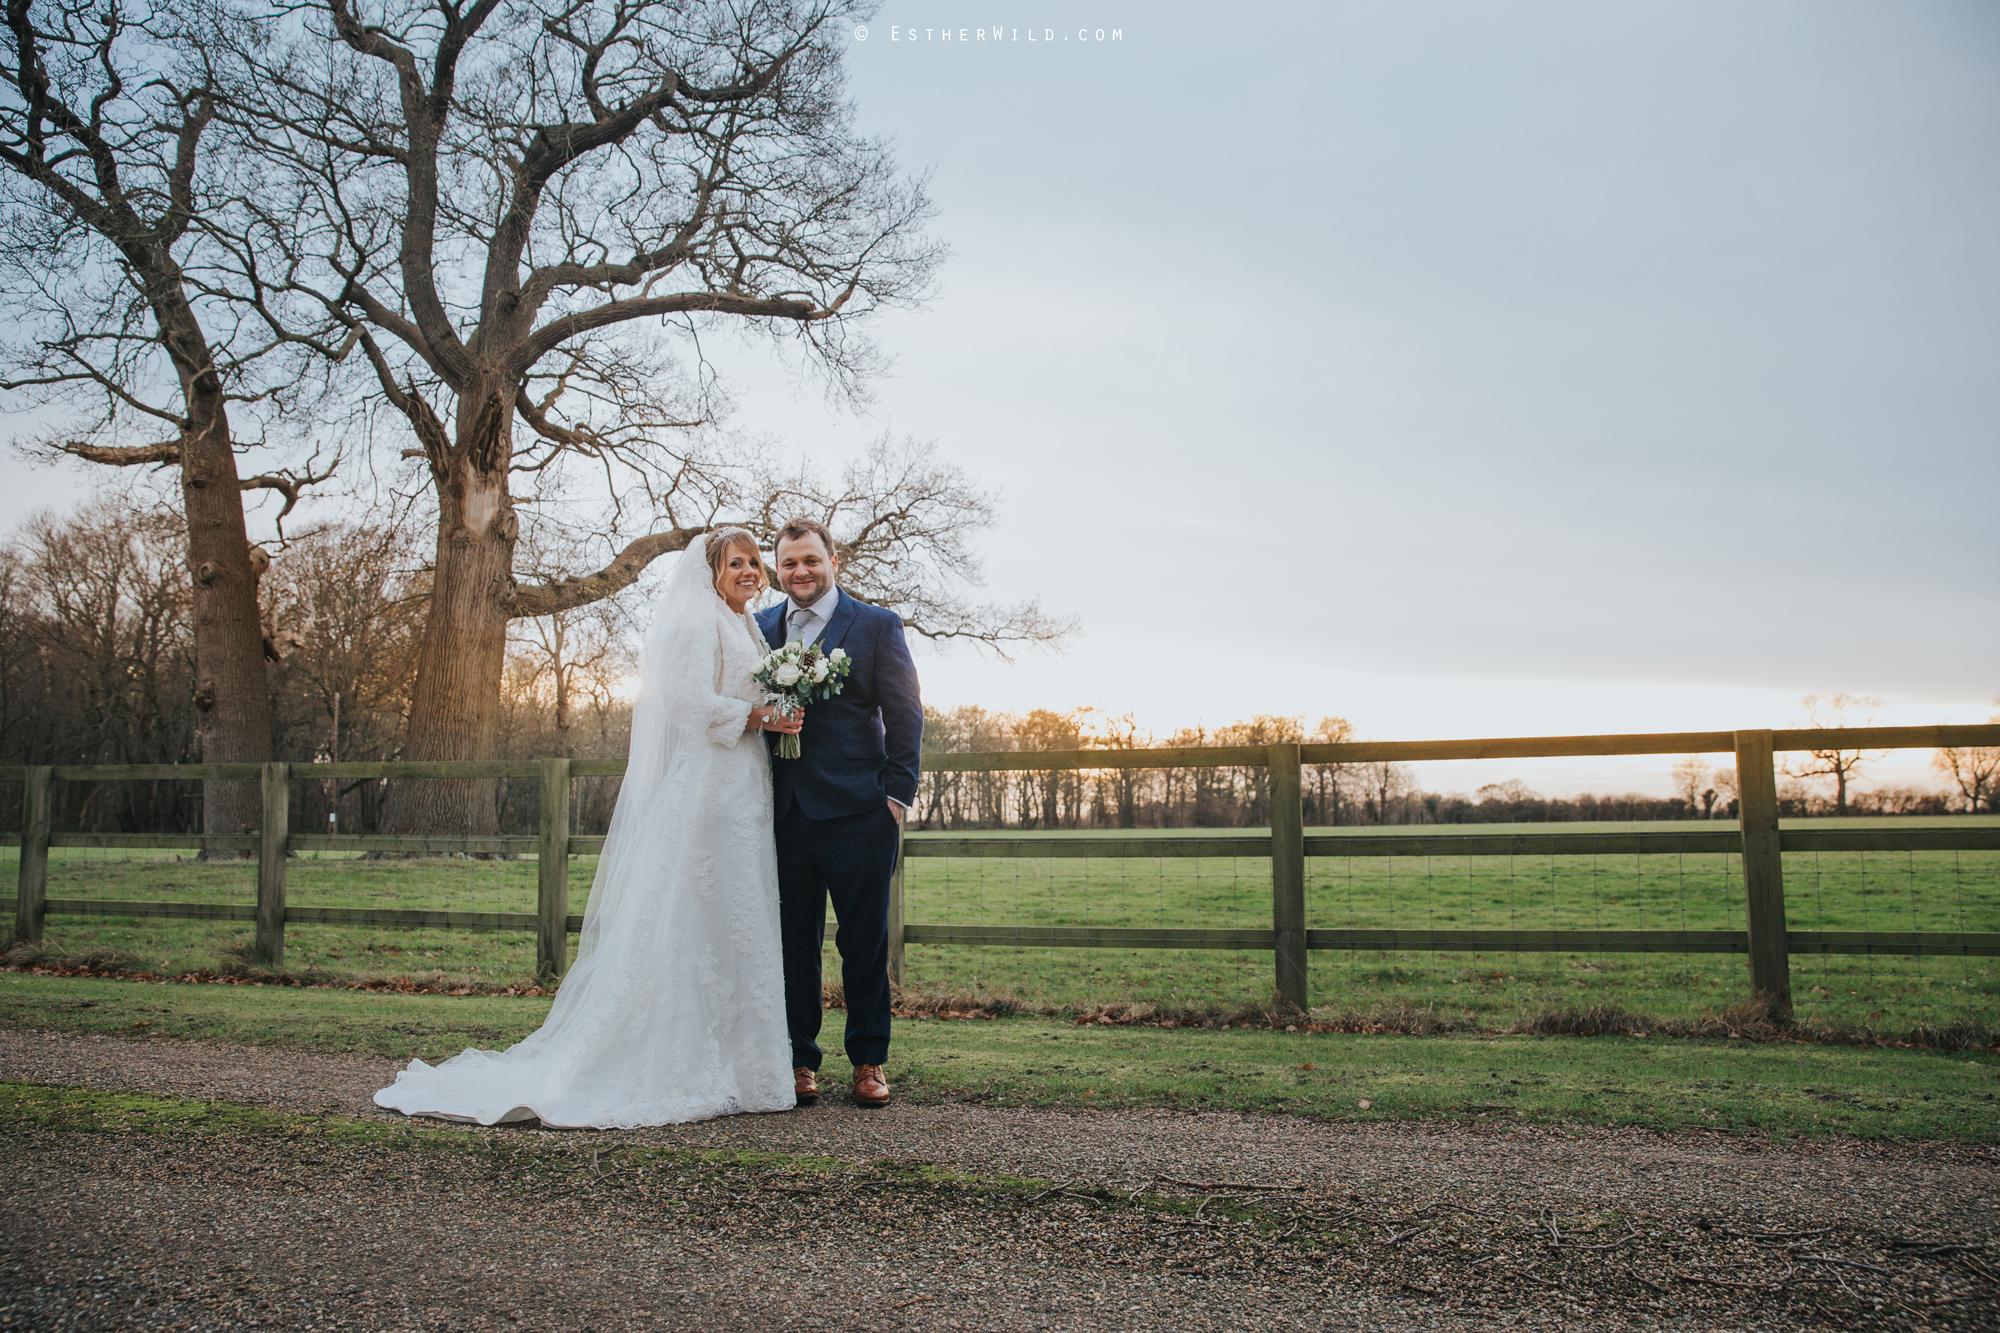 Wedding_Photography_Diss_Gawdy_Hall_Redenhall_Church_Norfolk_Winter_Esther_Wild_Copyright_IMG_1847.jpg